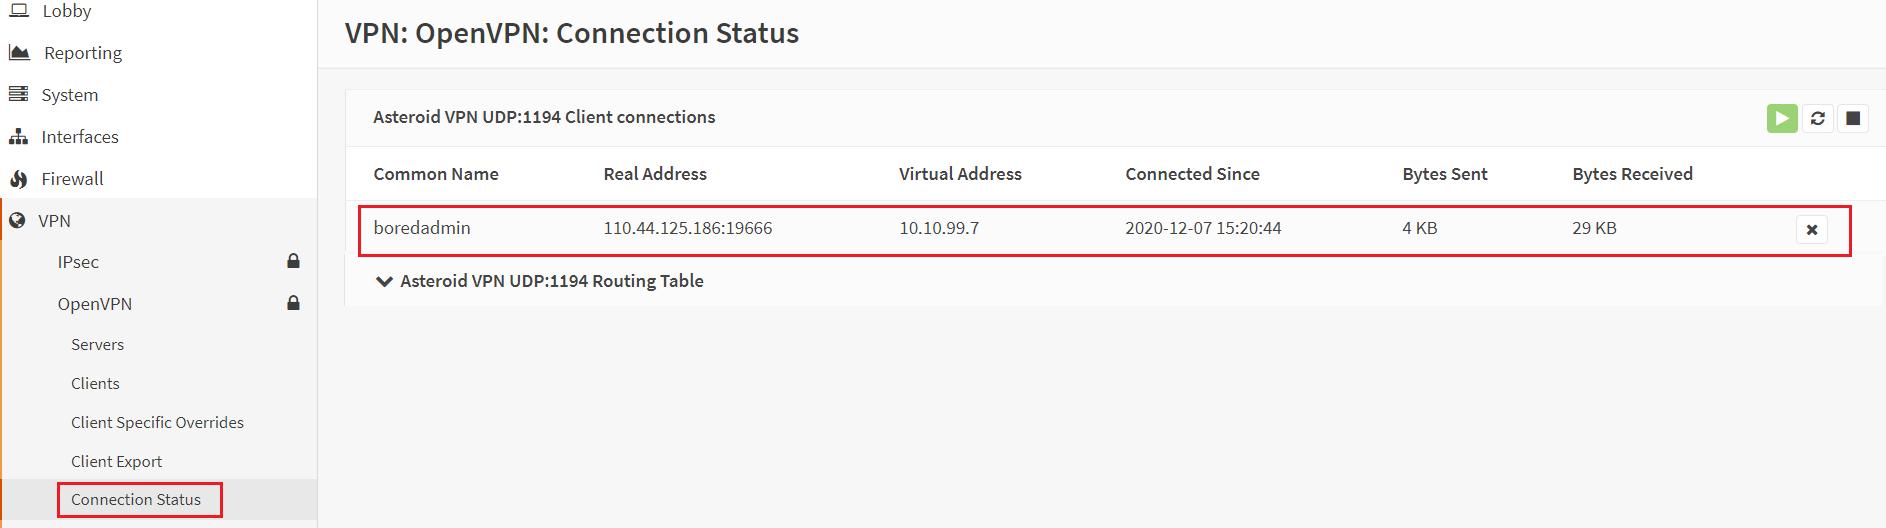 connection status of OpenVPN client